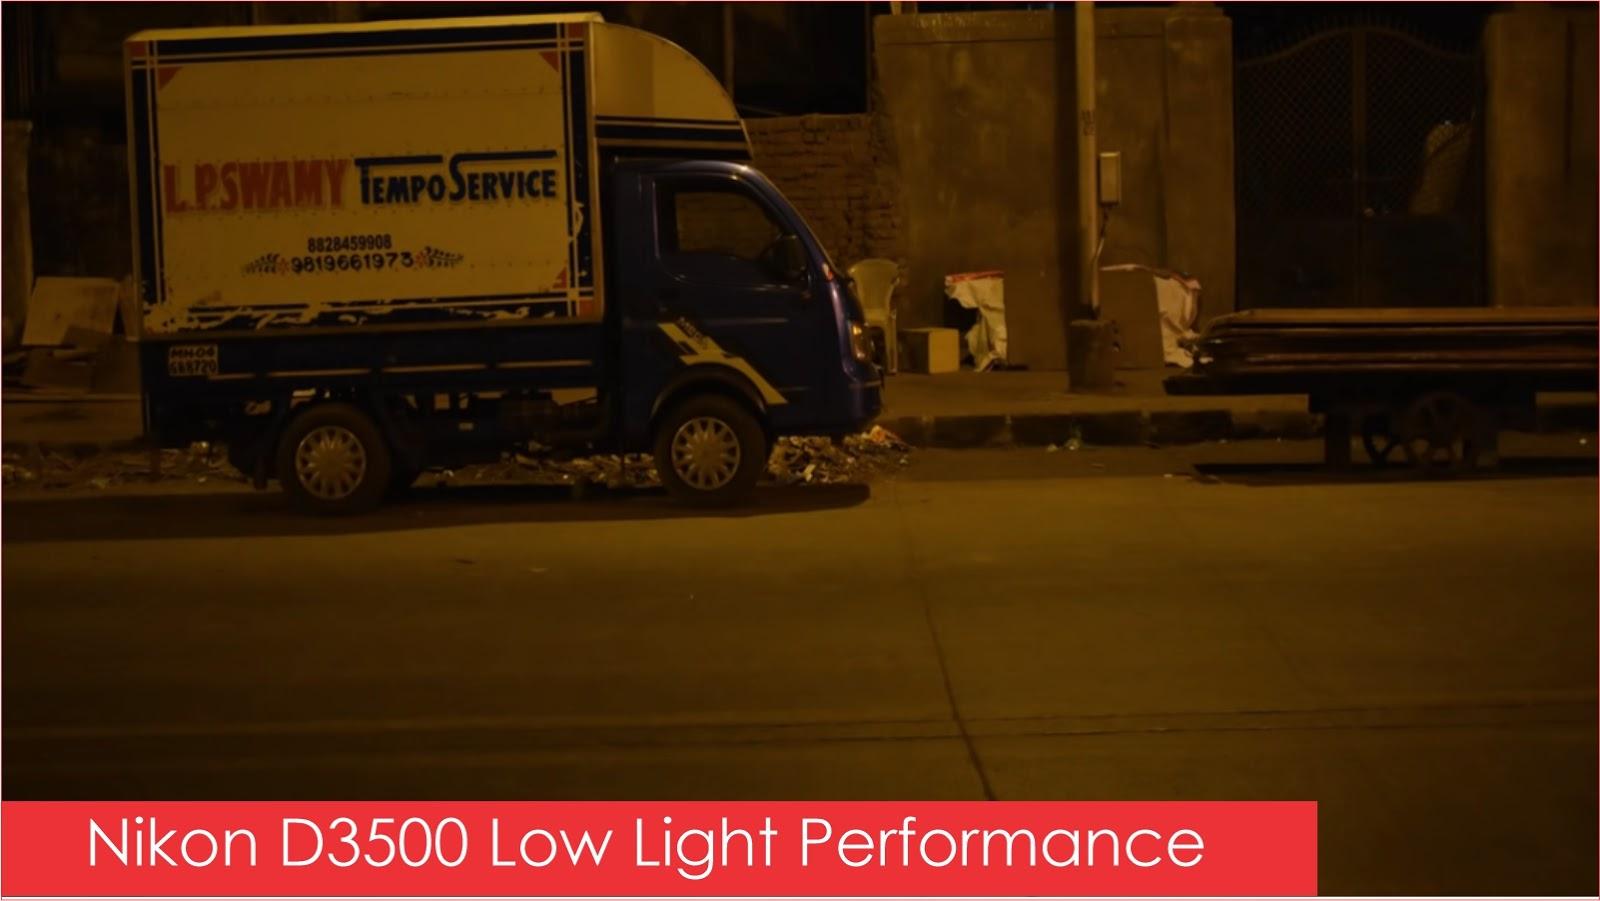 Nikon D3500 Camera Low Light Image Performance